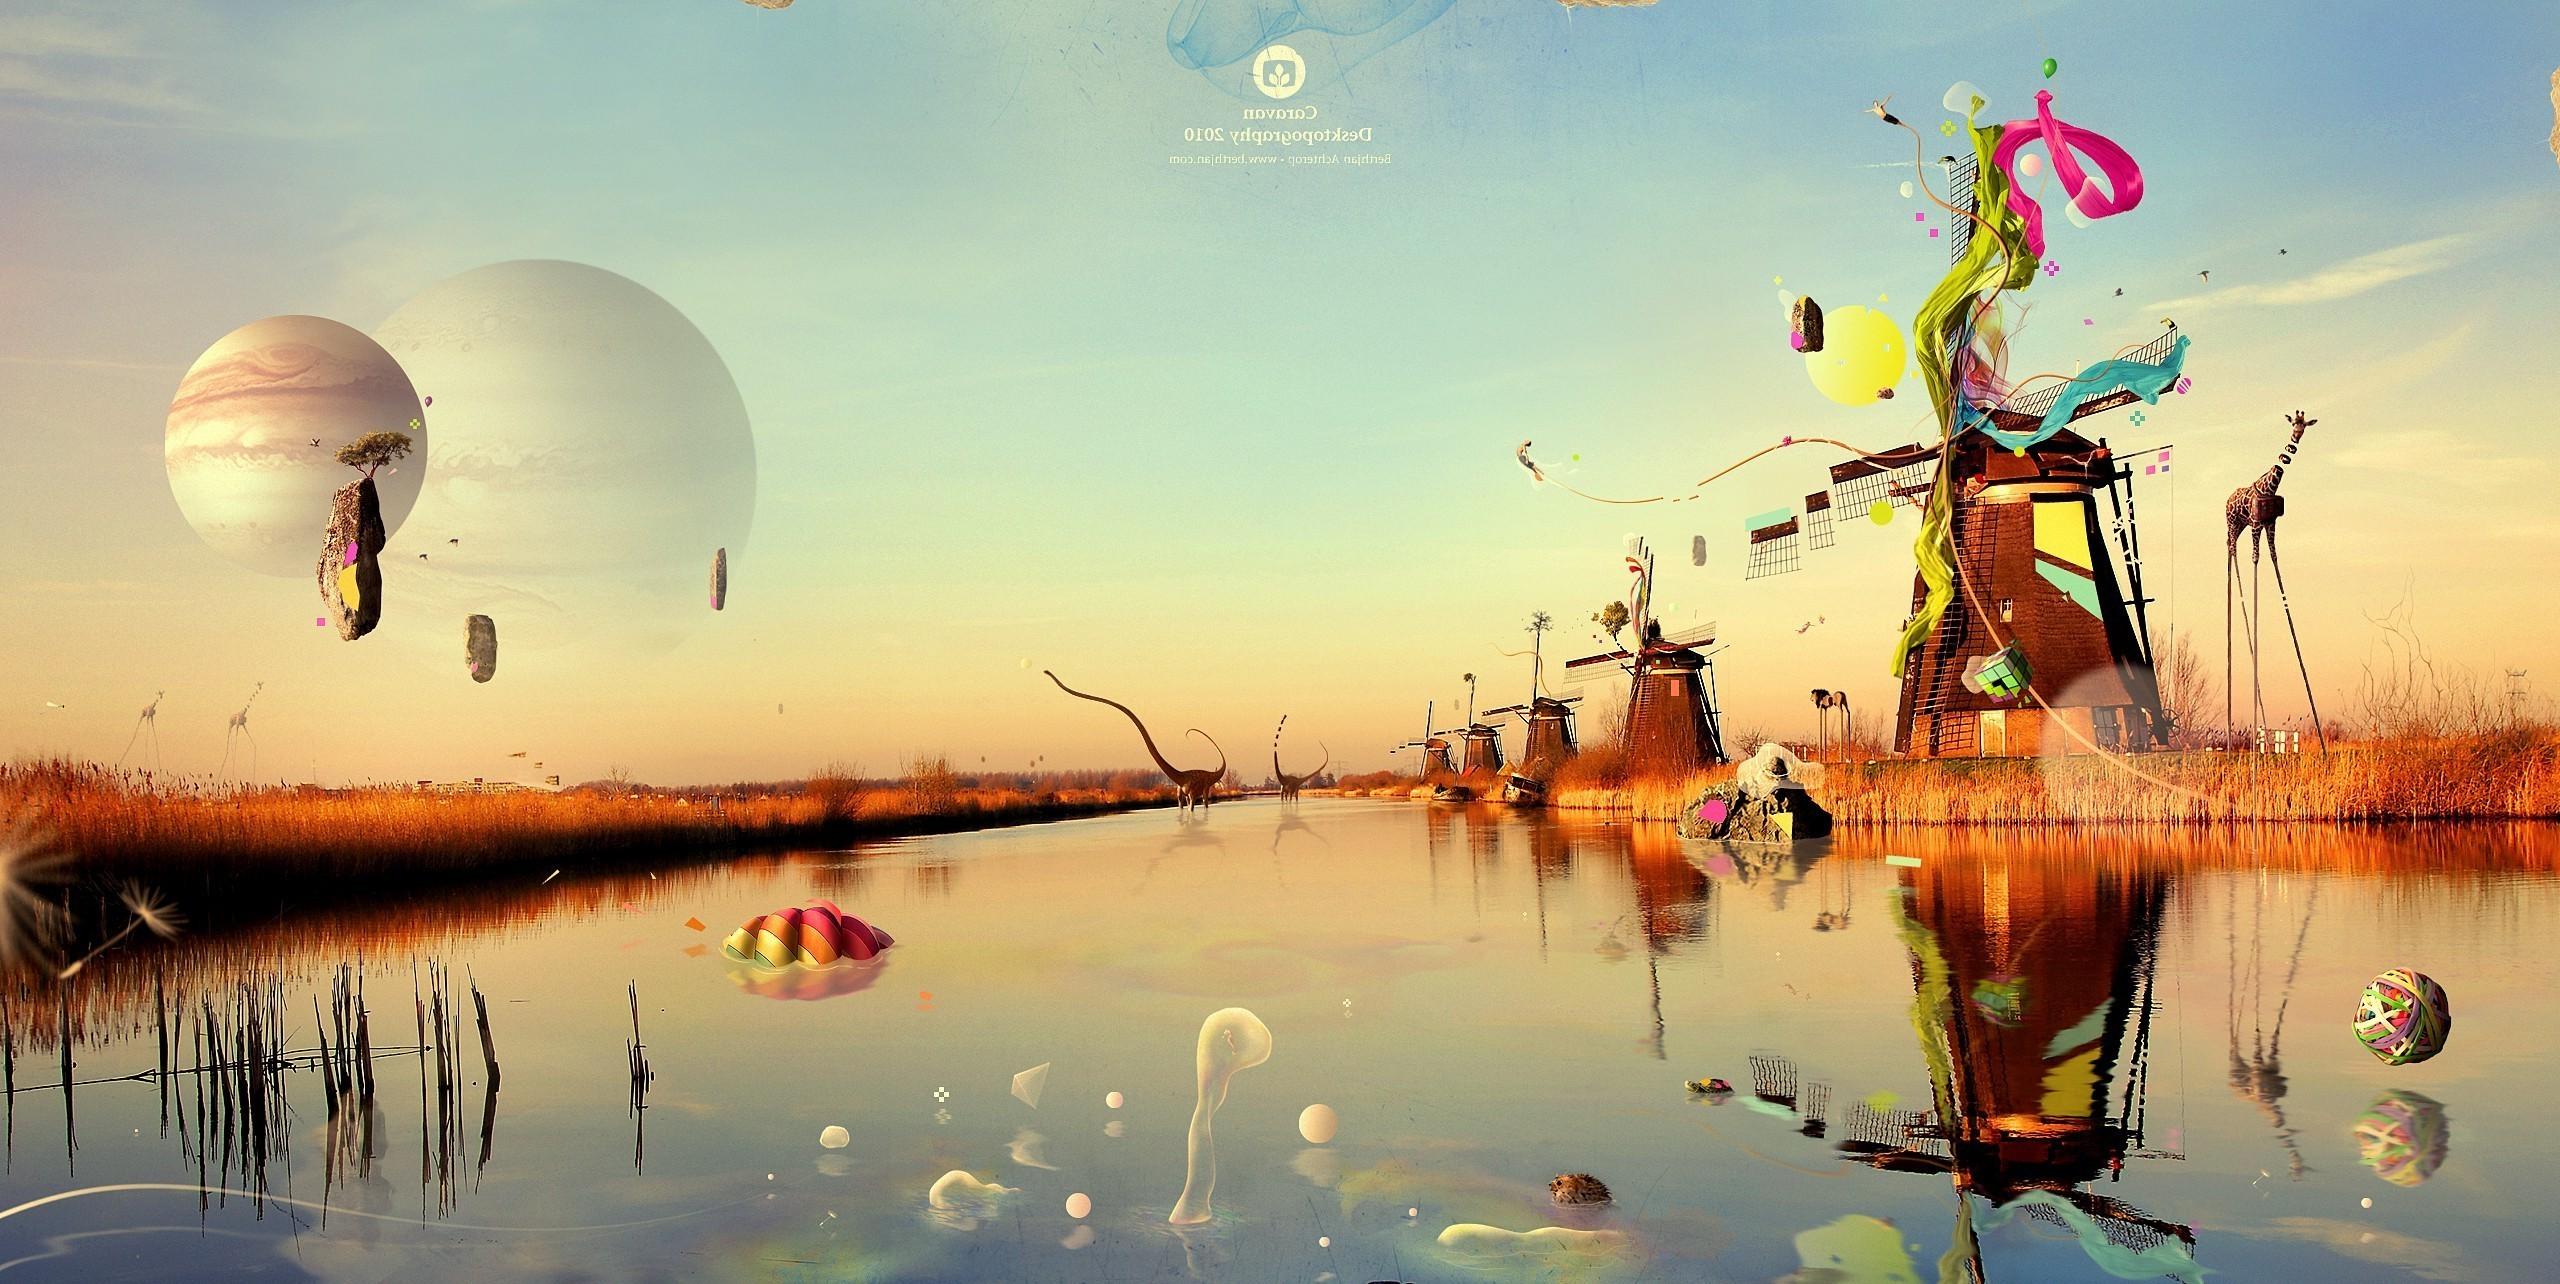 Backgrounds Surrealism Art Hd Desktop Wallpaper Widescreen: Surreal Desktop Backgrounds ·① WallpaperTag